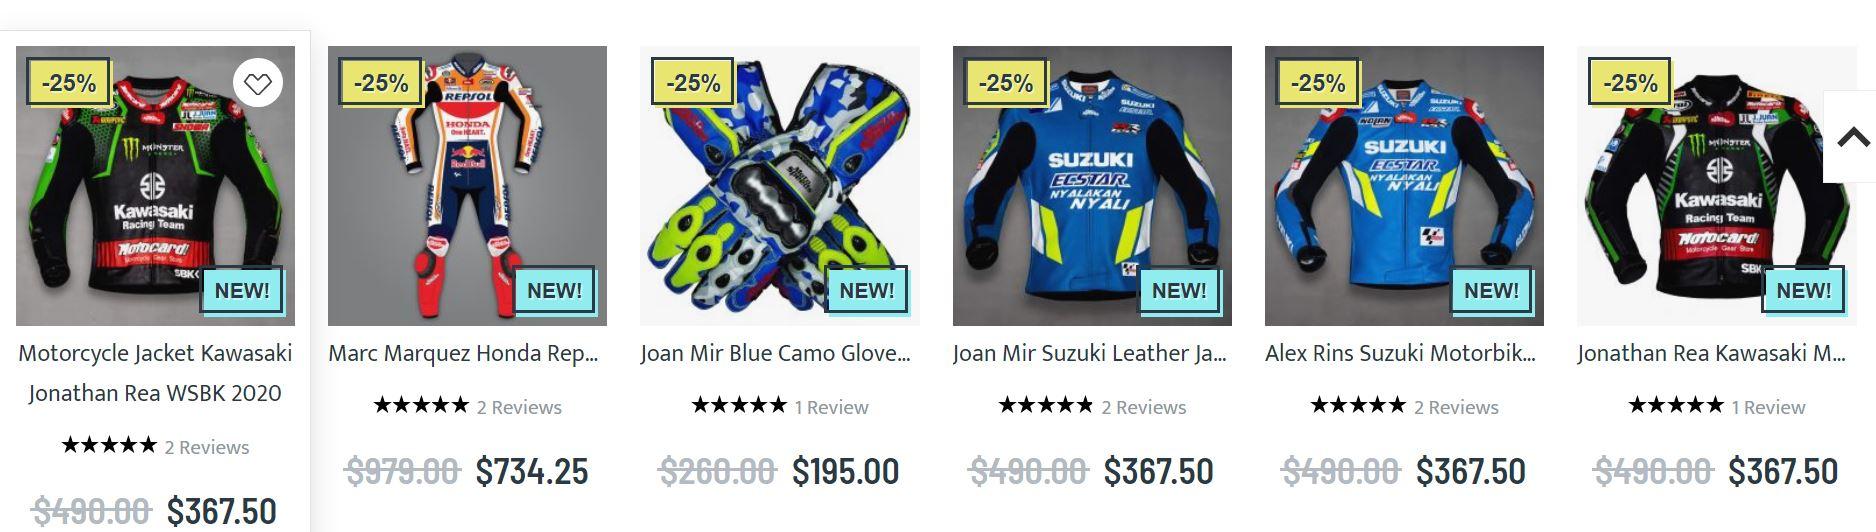 Designer biker jackets